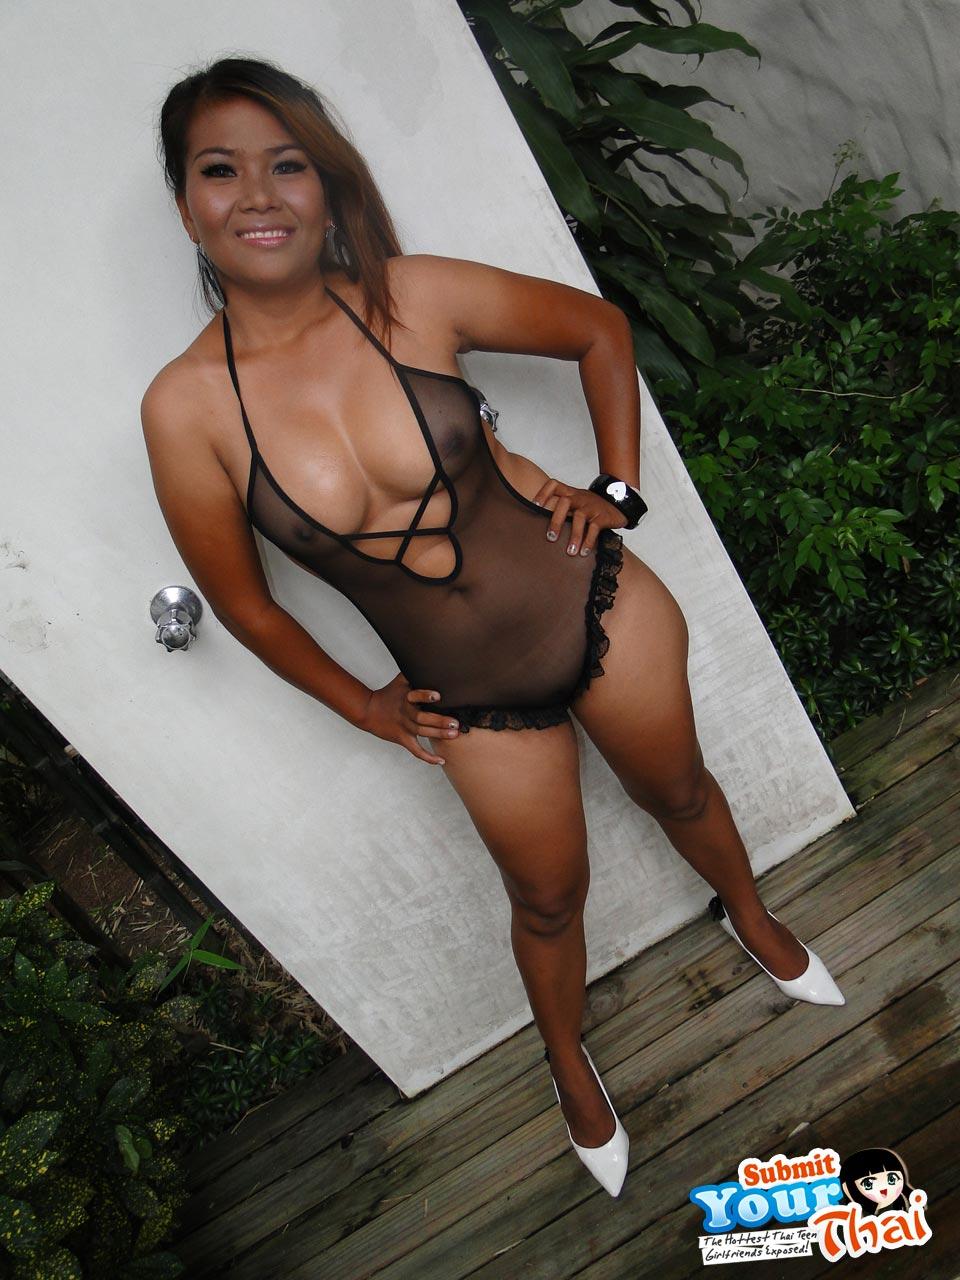 nadia getting nude coed